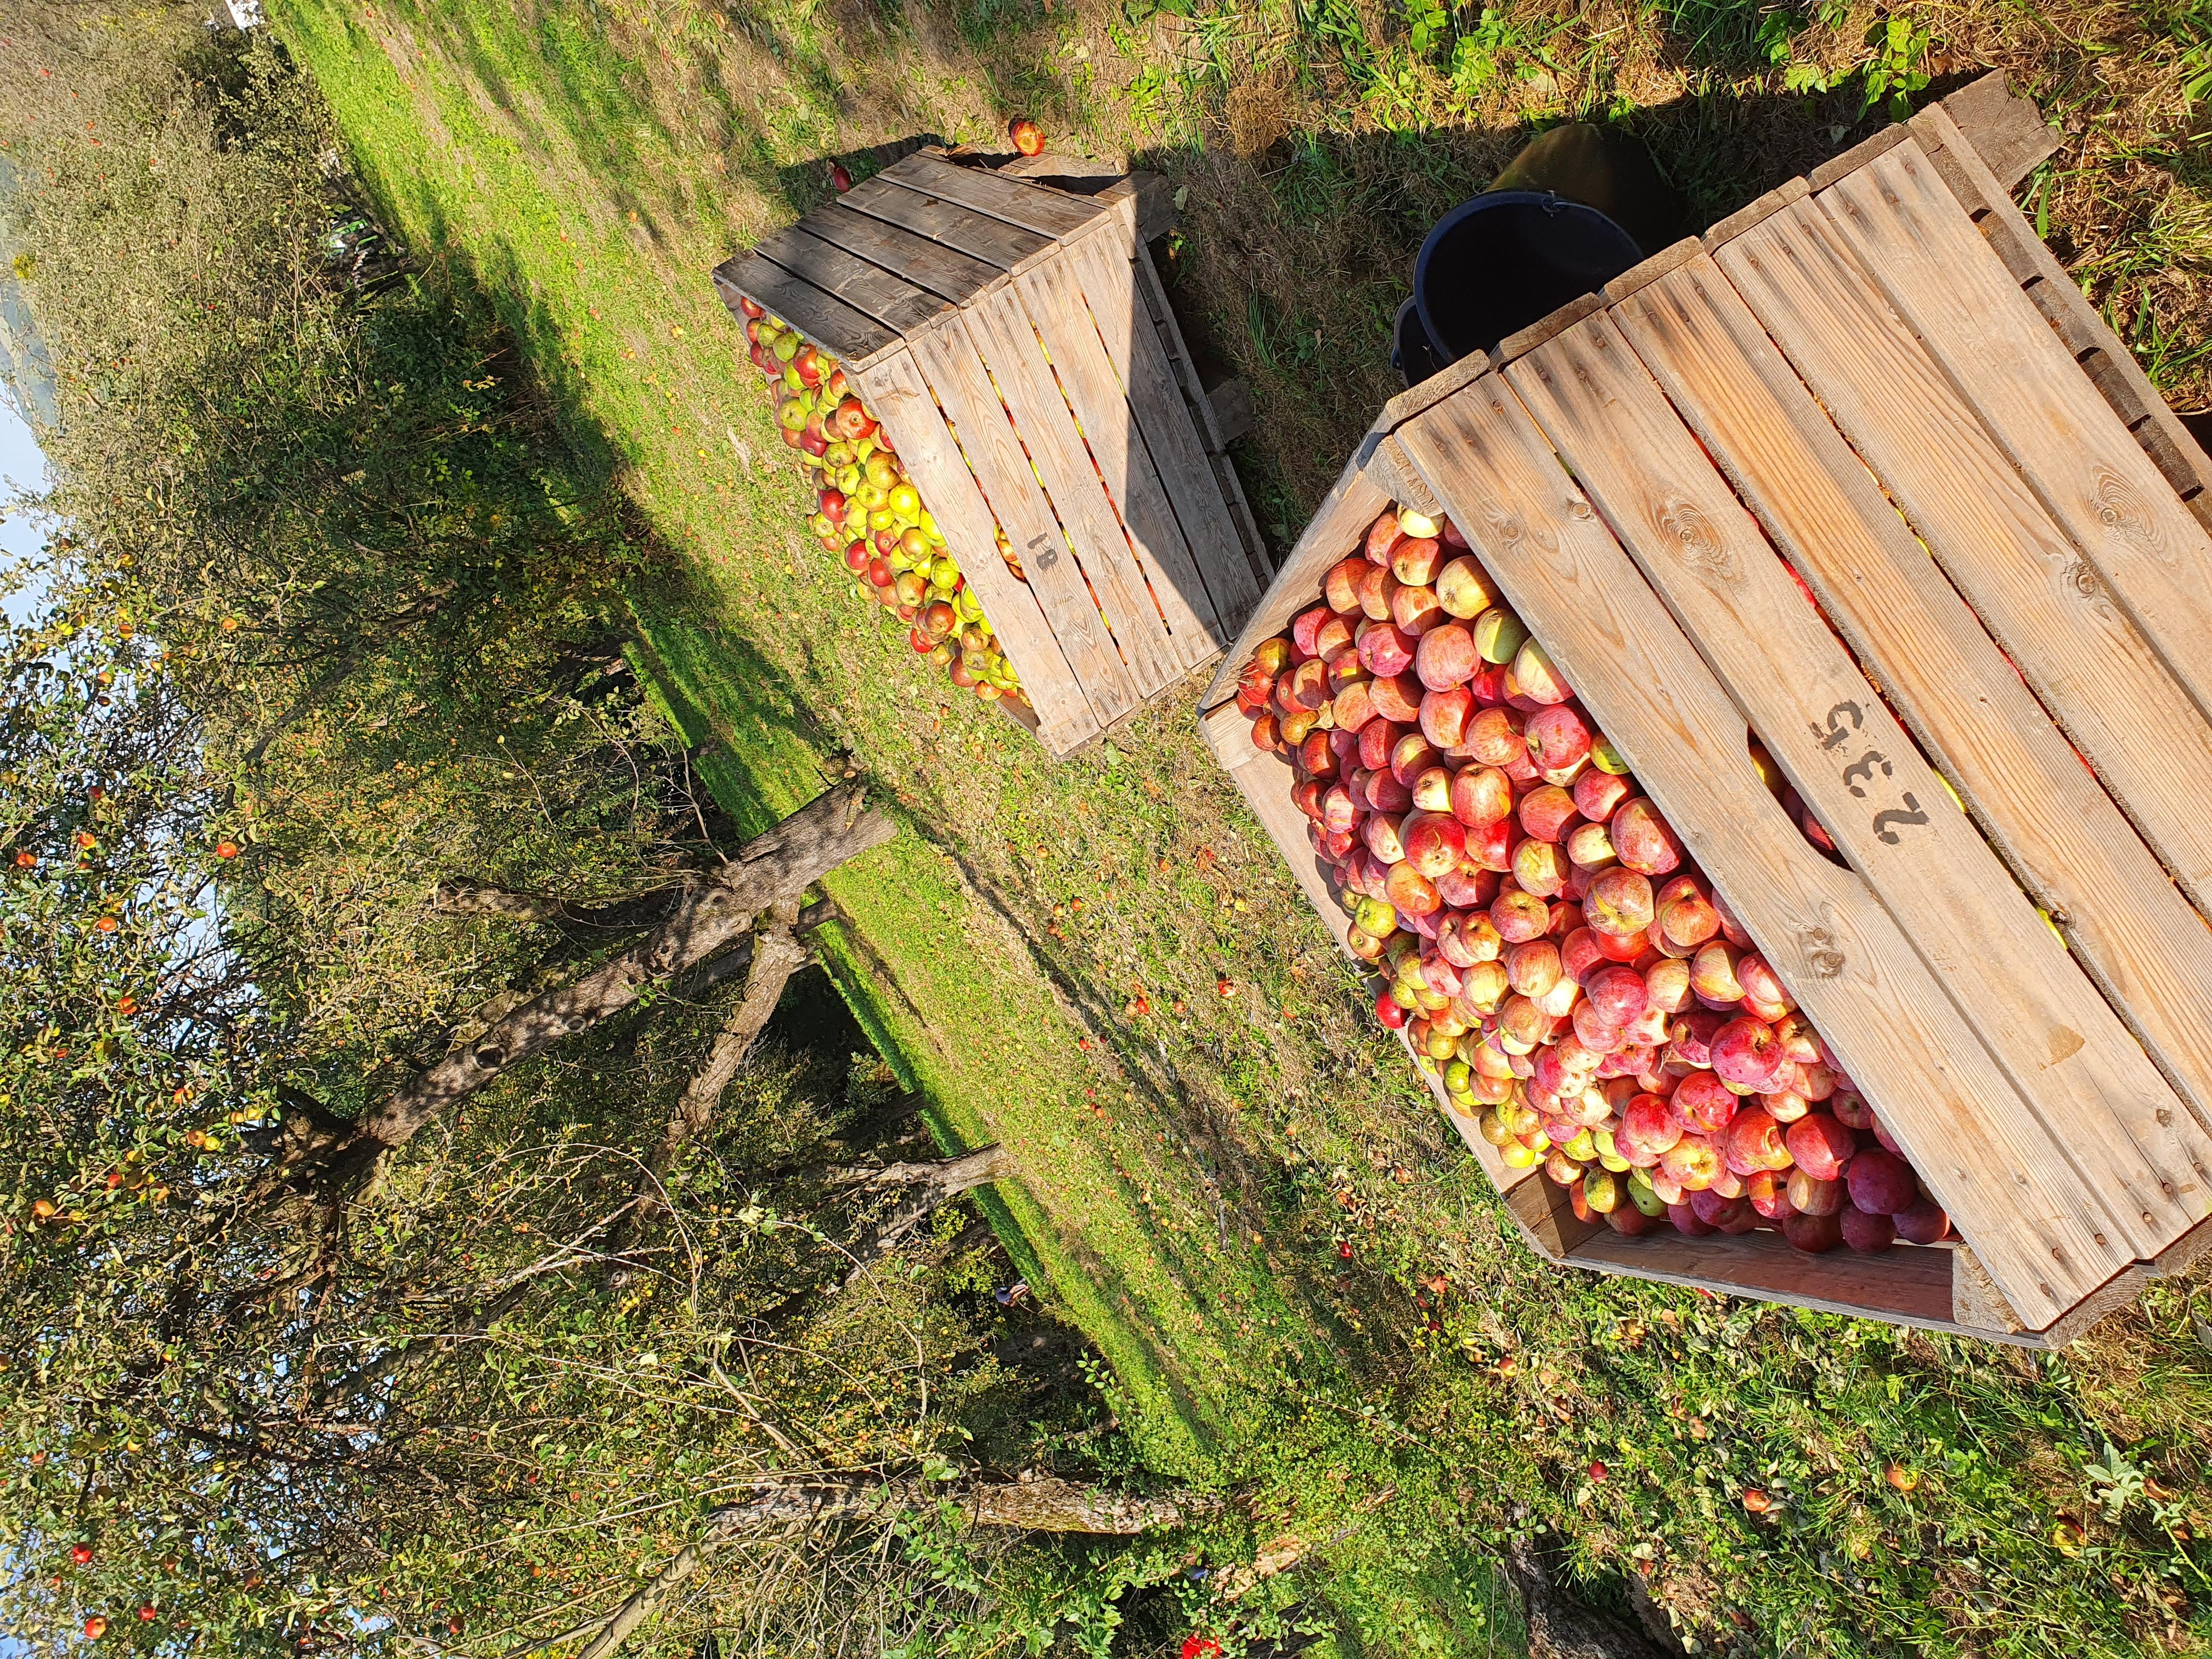 Apfelernte Streuobstanlage